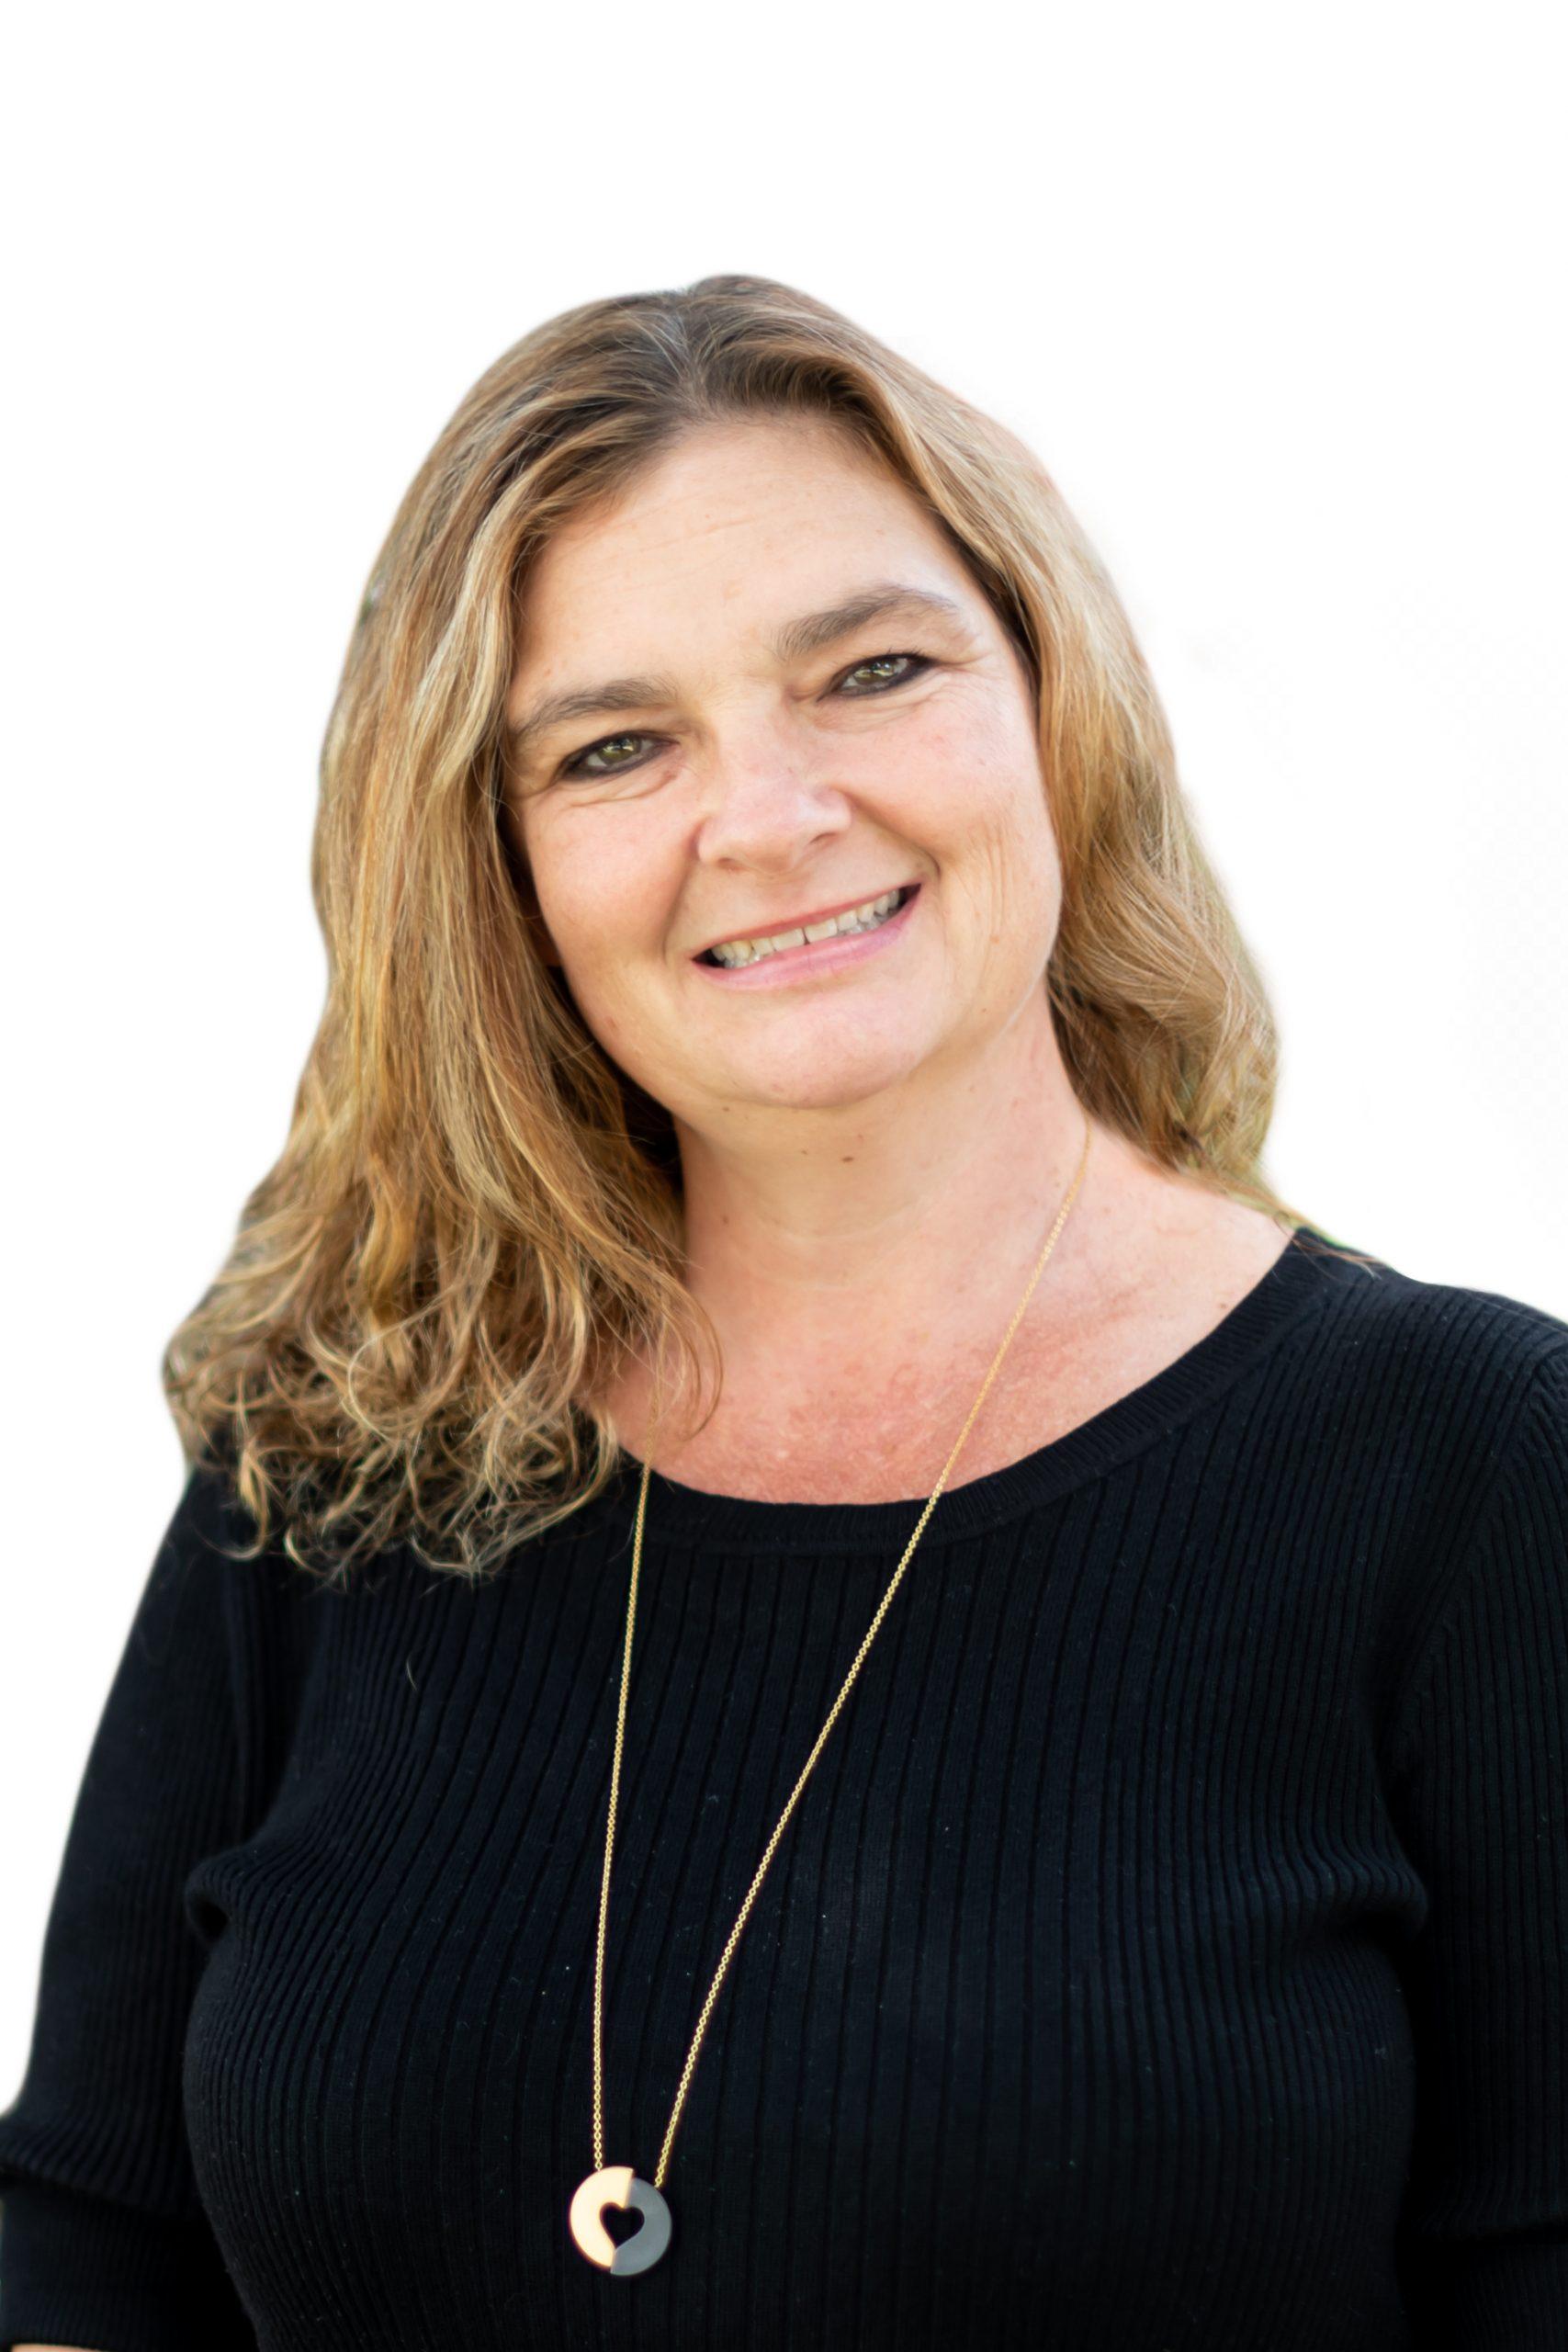 Heidi Kling Therapist in Houston, TX